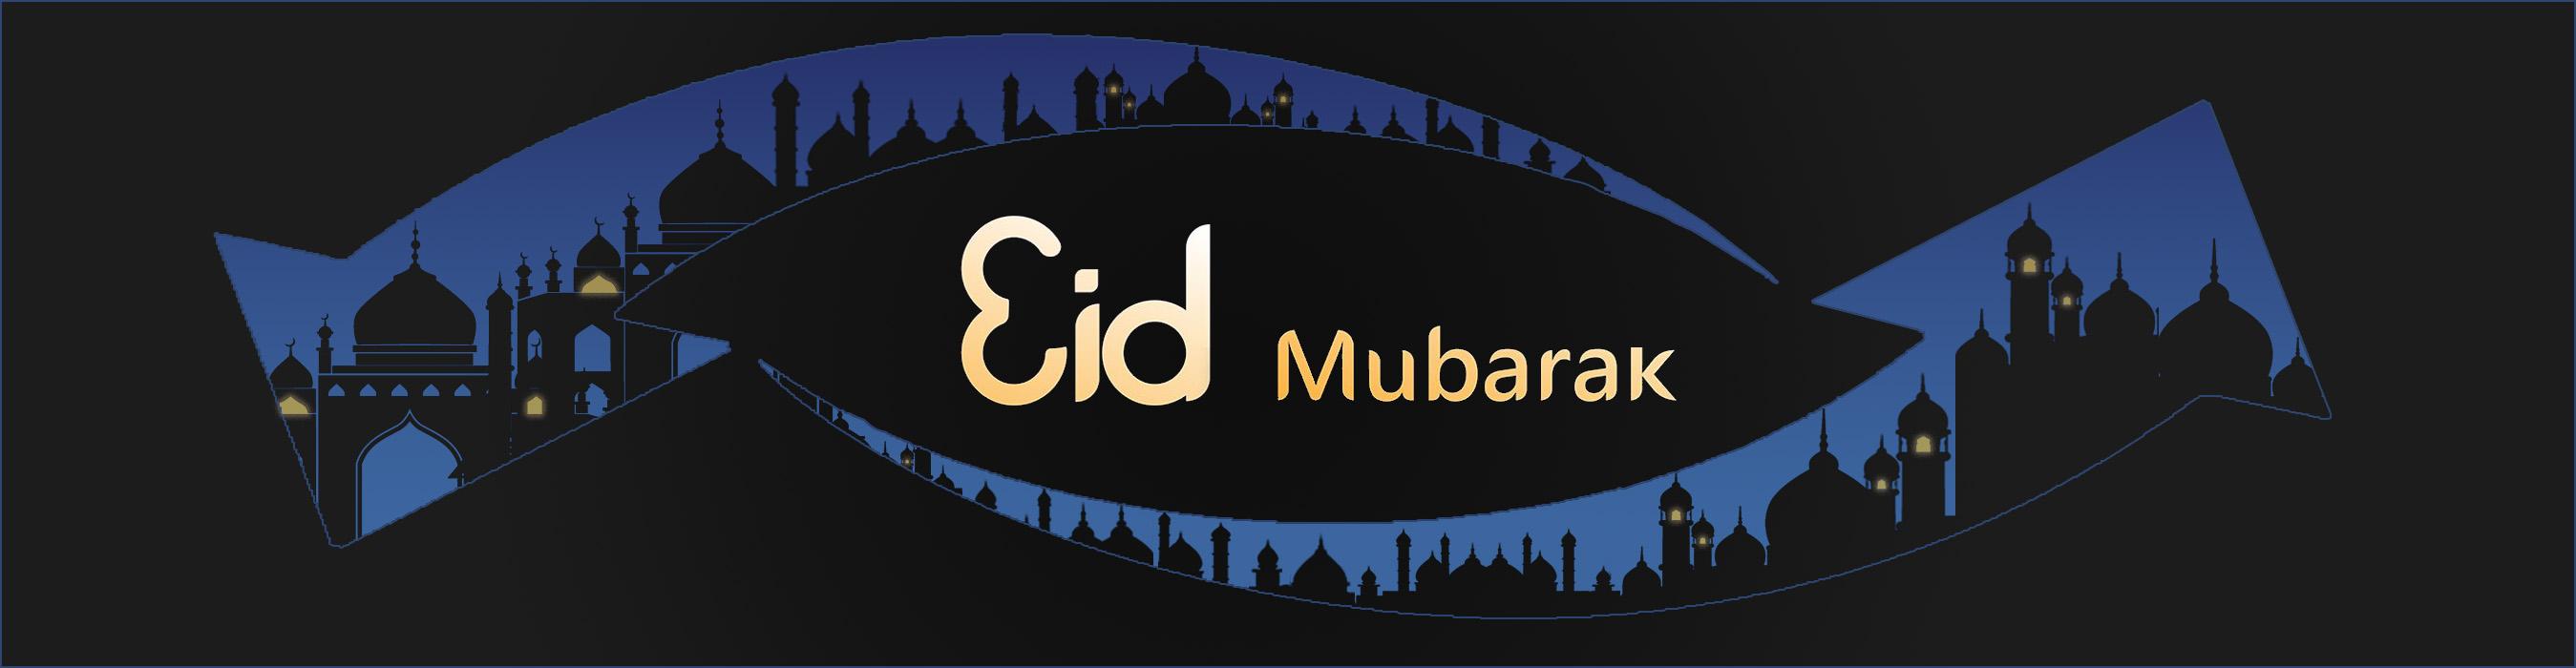 Eid Al-Fitr tct